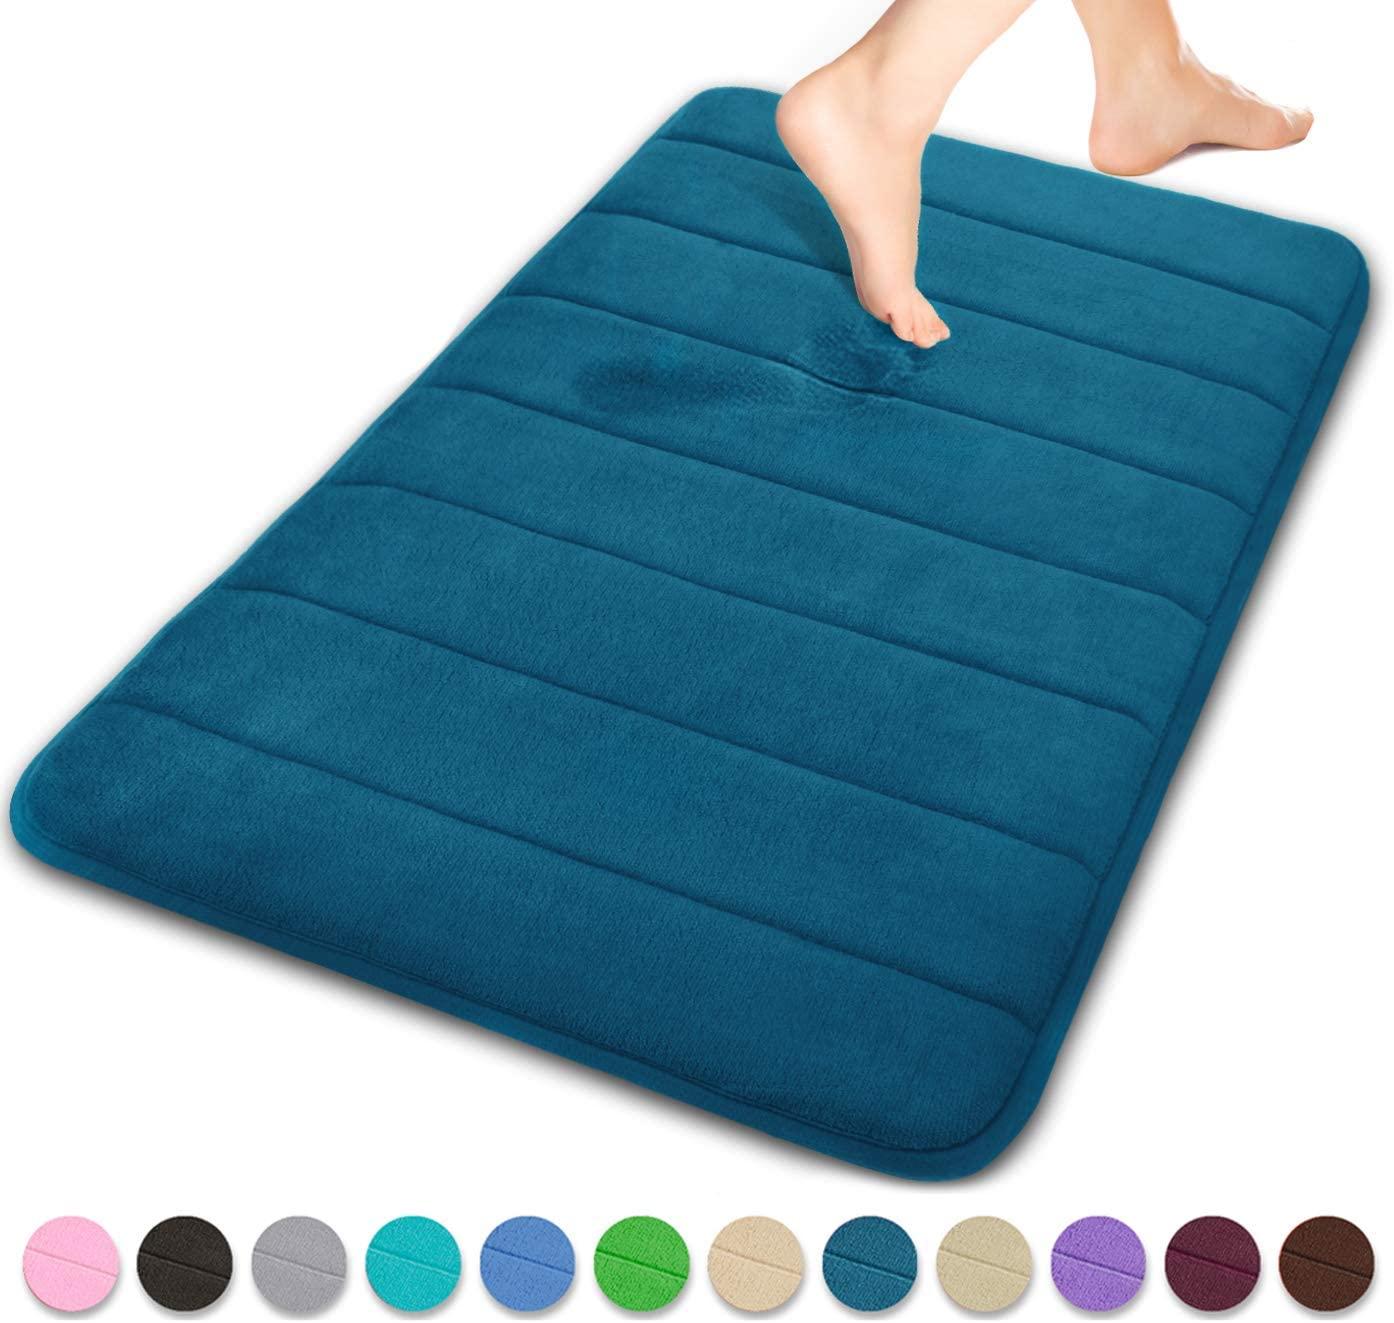 Yimobra Memory Foam Bath Mat Large Size 31.5 by 19.8 Inches,